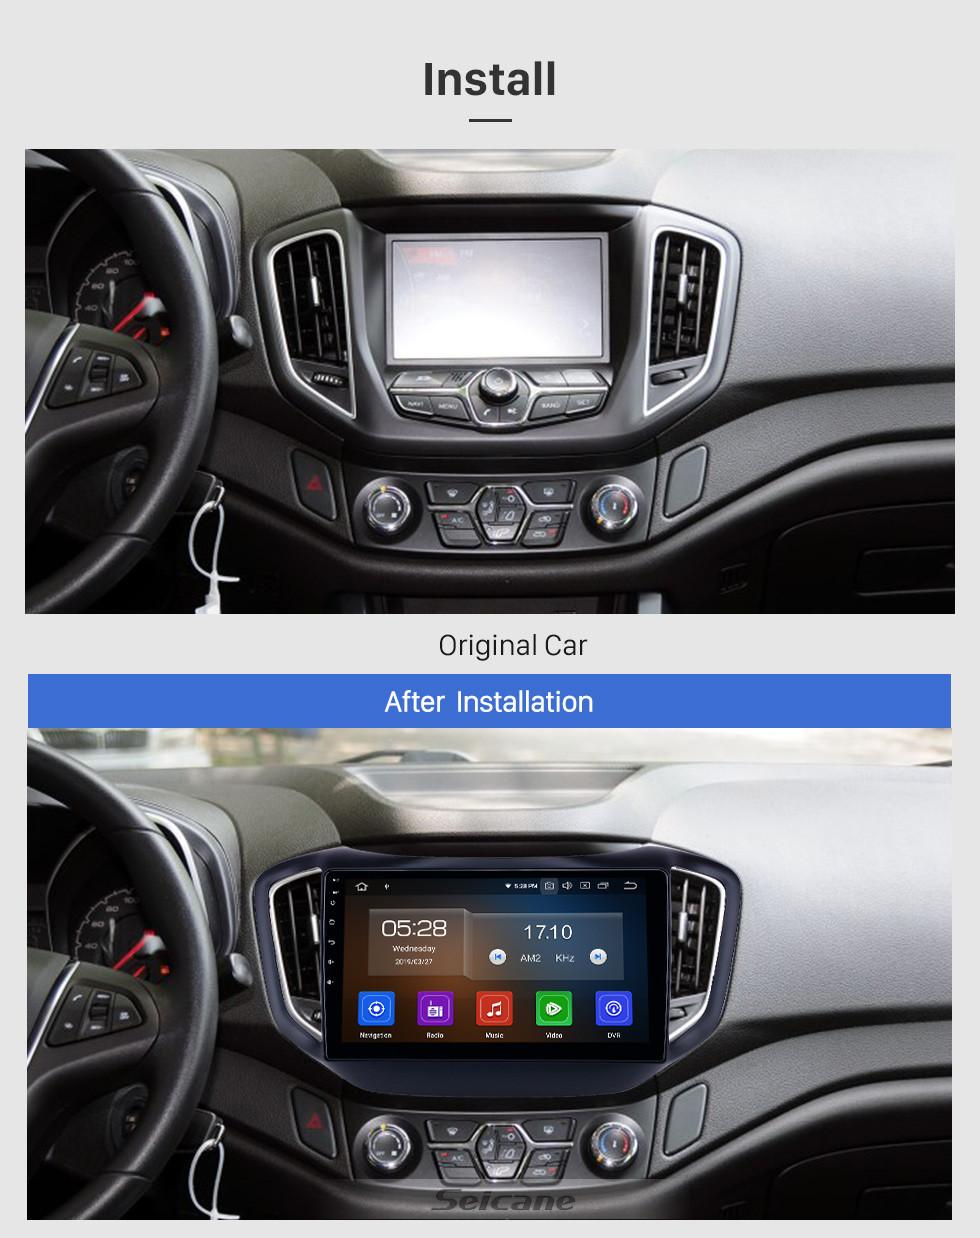 Seicane 10,1 Zoll HD Touchscreen 2014-2017 Chery Tiggo 5 Android 9.0 GPS Navigationsradio Bluetooth WIFI Carplay Unterstützung TPMS OBD2